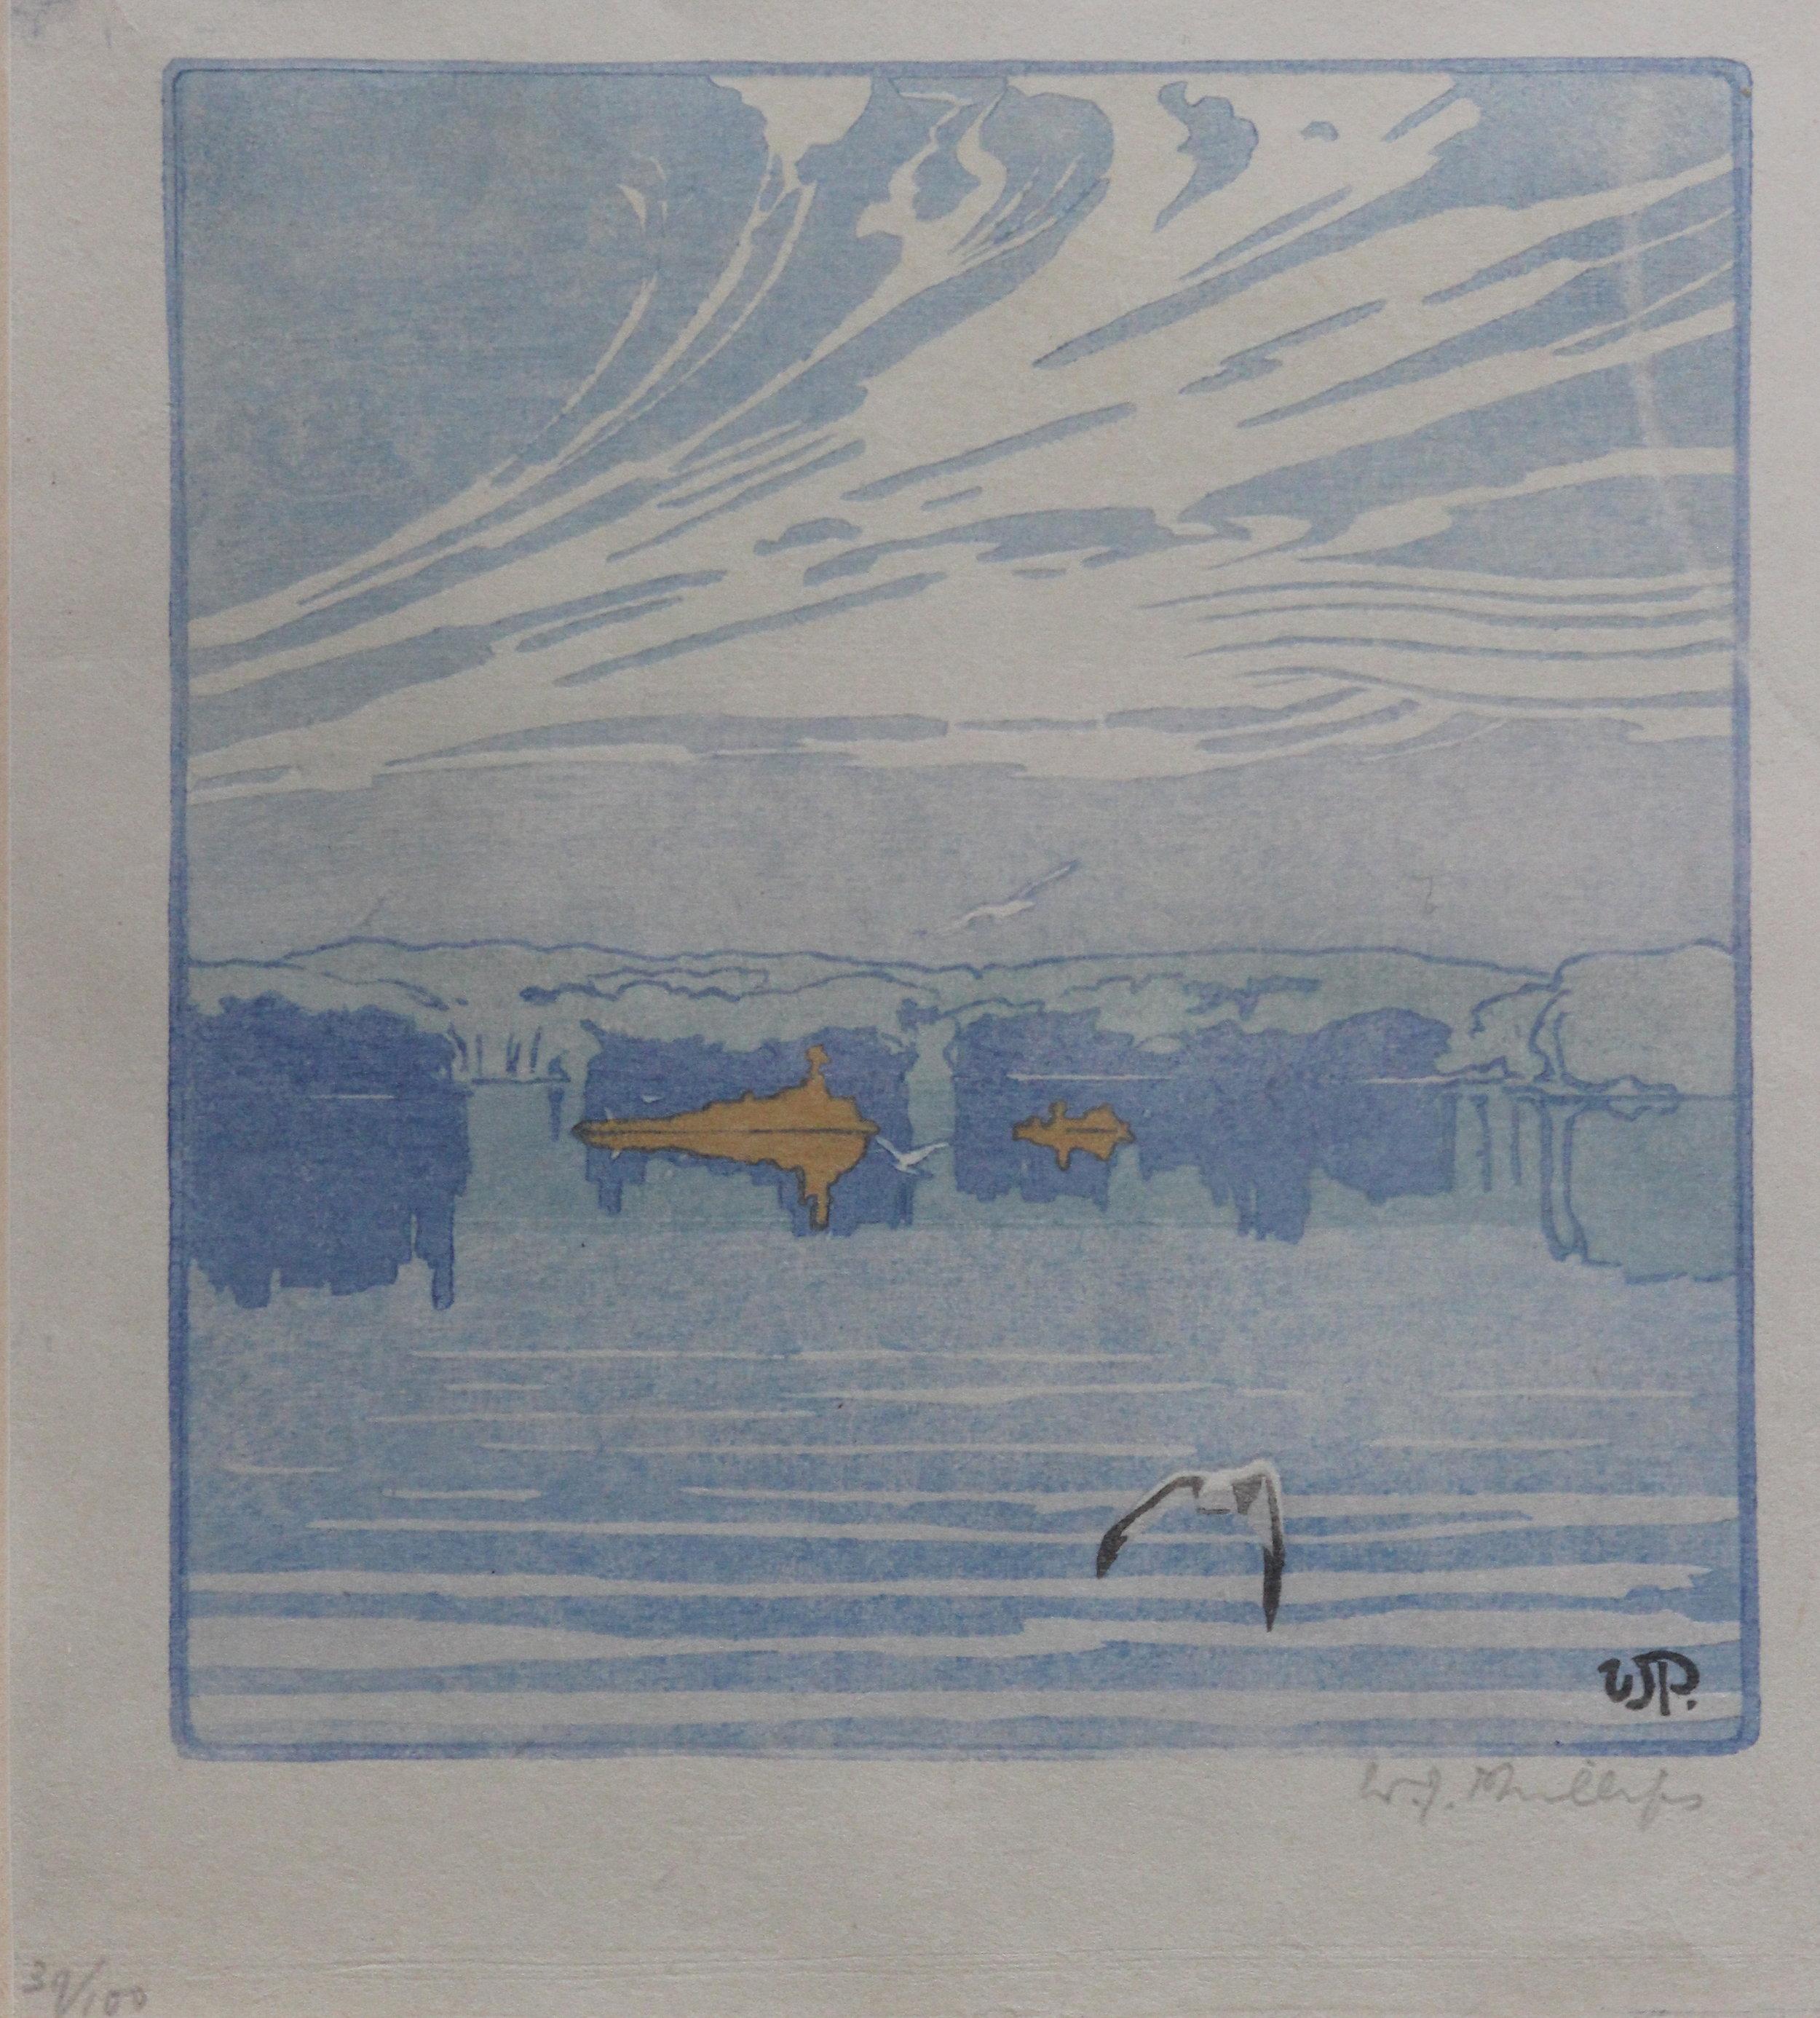 Walter J. Phillips, The Lake, 1918